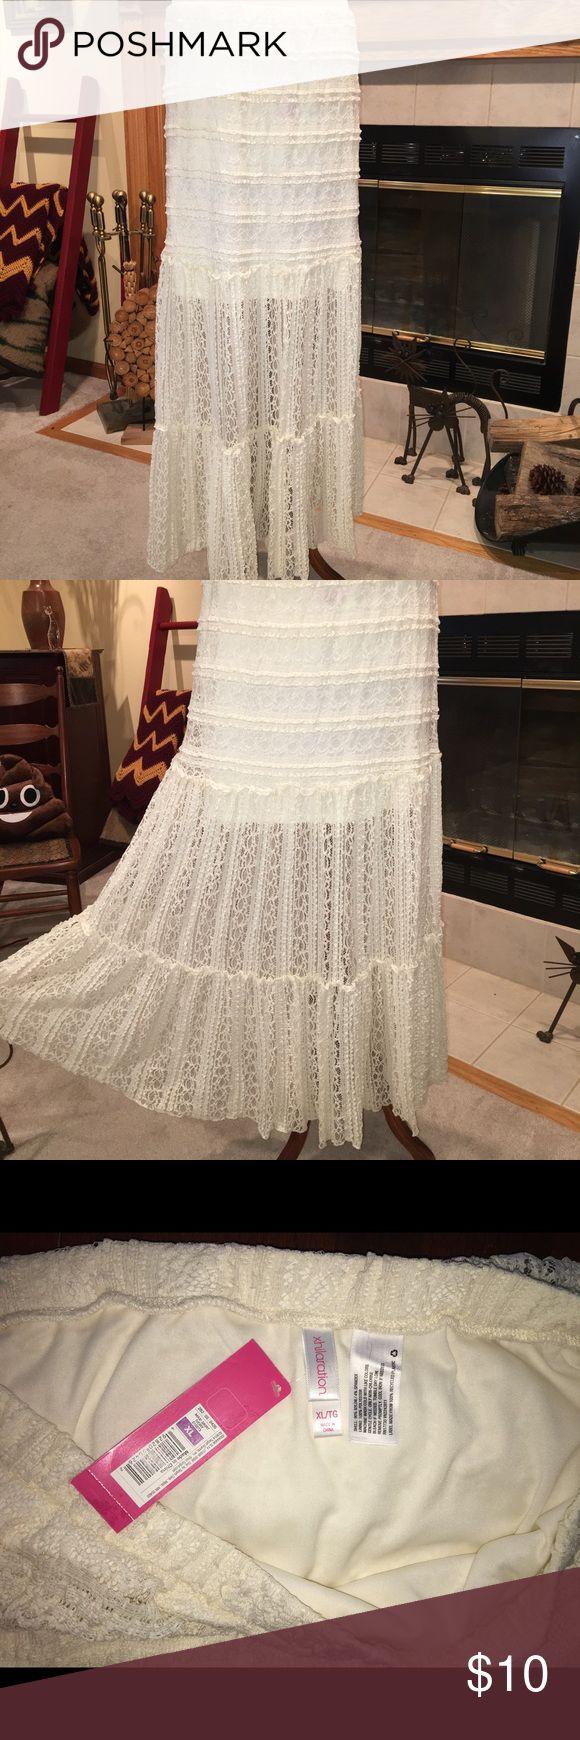 NWT boho lace maxi skirt Pretty boho lace maxi skirt. Lined to just above the knee. Xhilaration Skirts Maxi